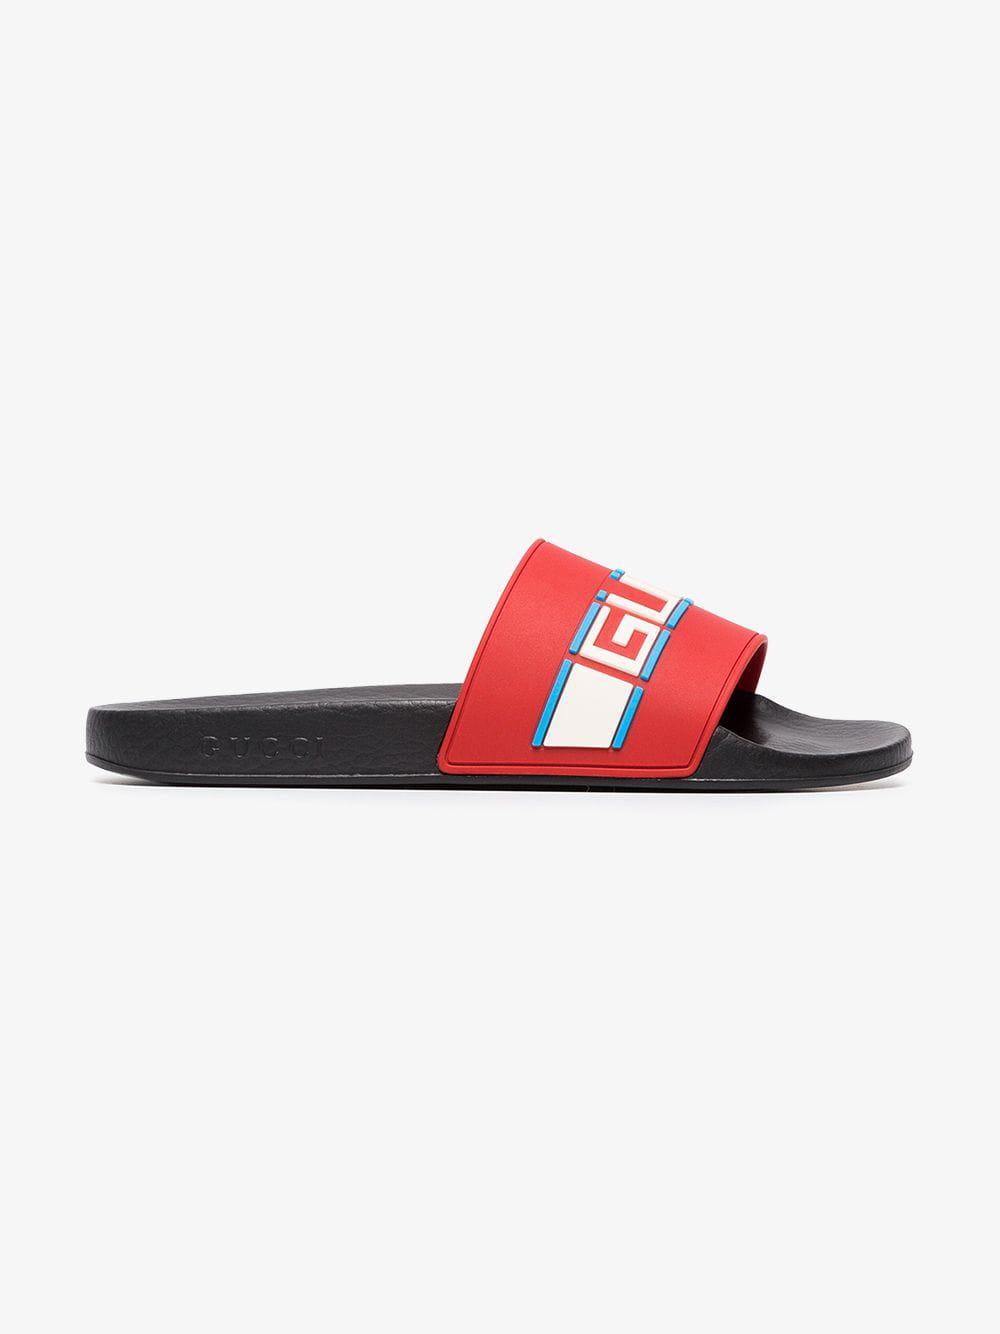 eb33d9fc56146e Gucci Poppy Azure Red Pursuit Sandals in Blue - Lyst